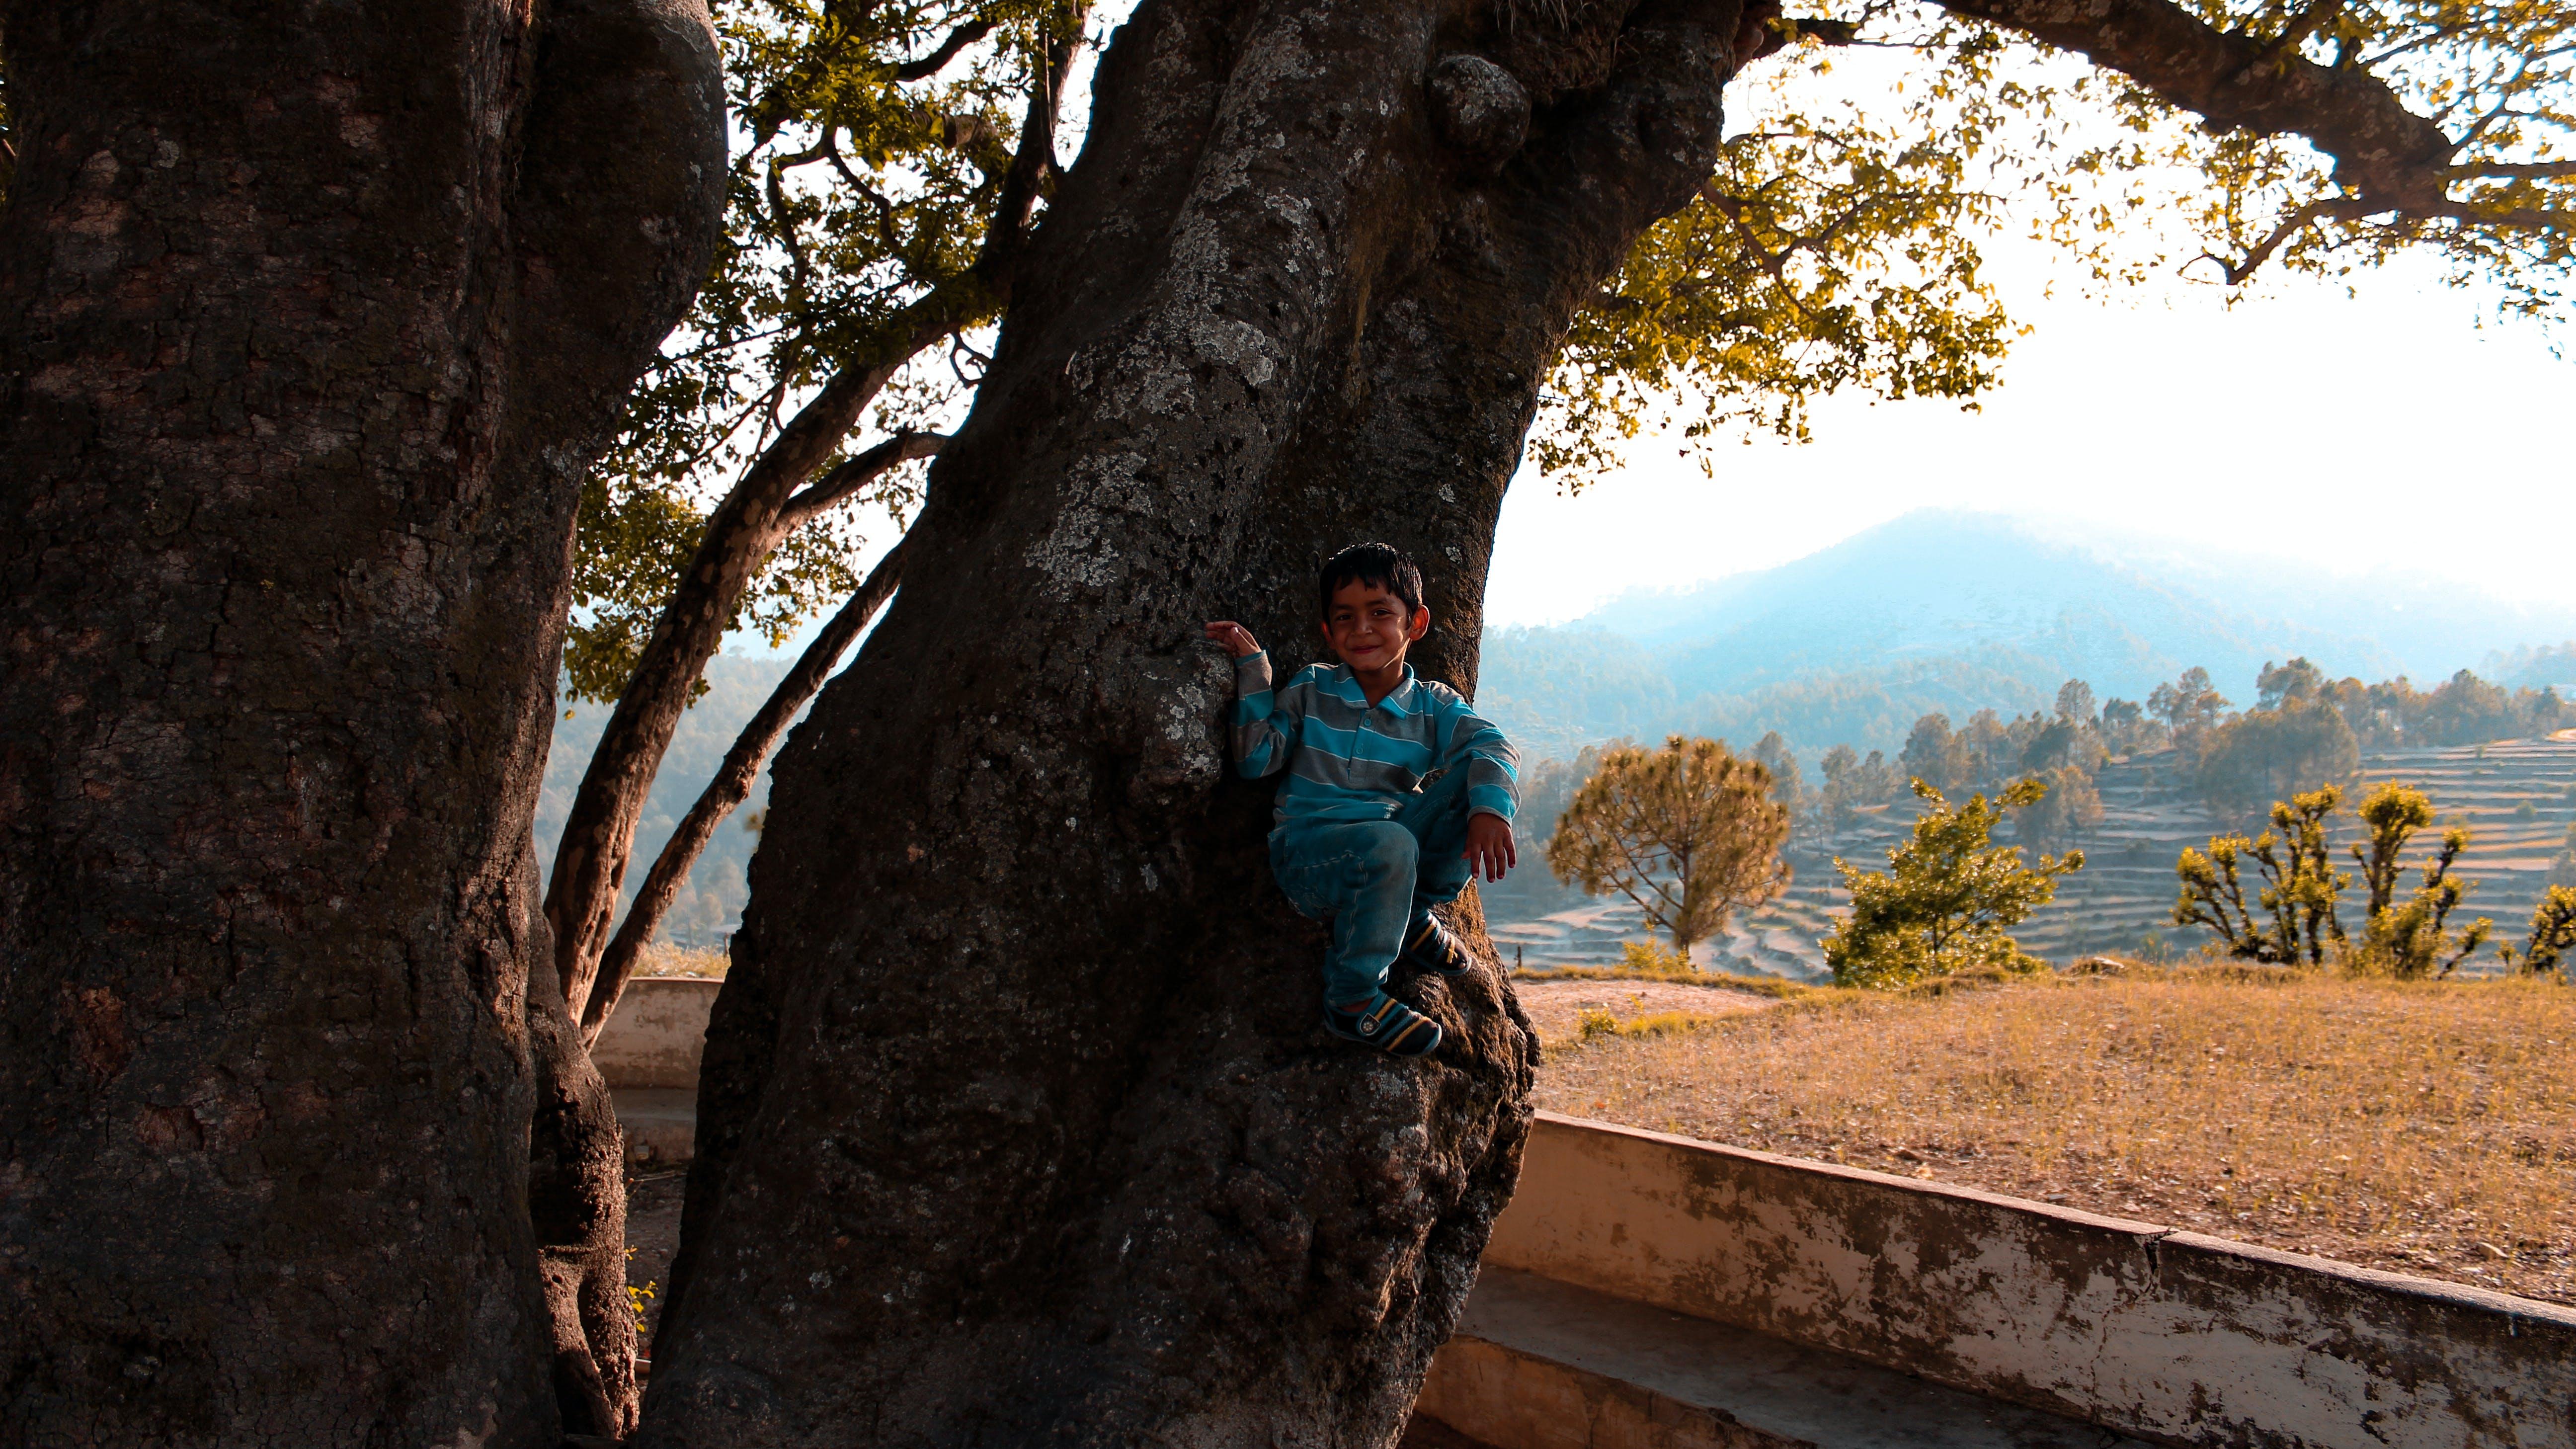 Boy Sitting On Tree